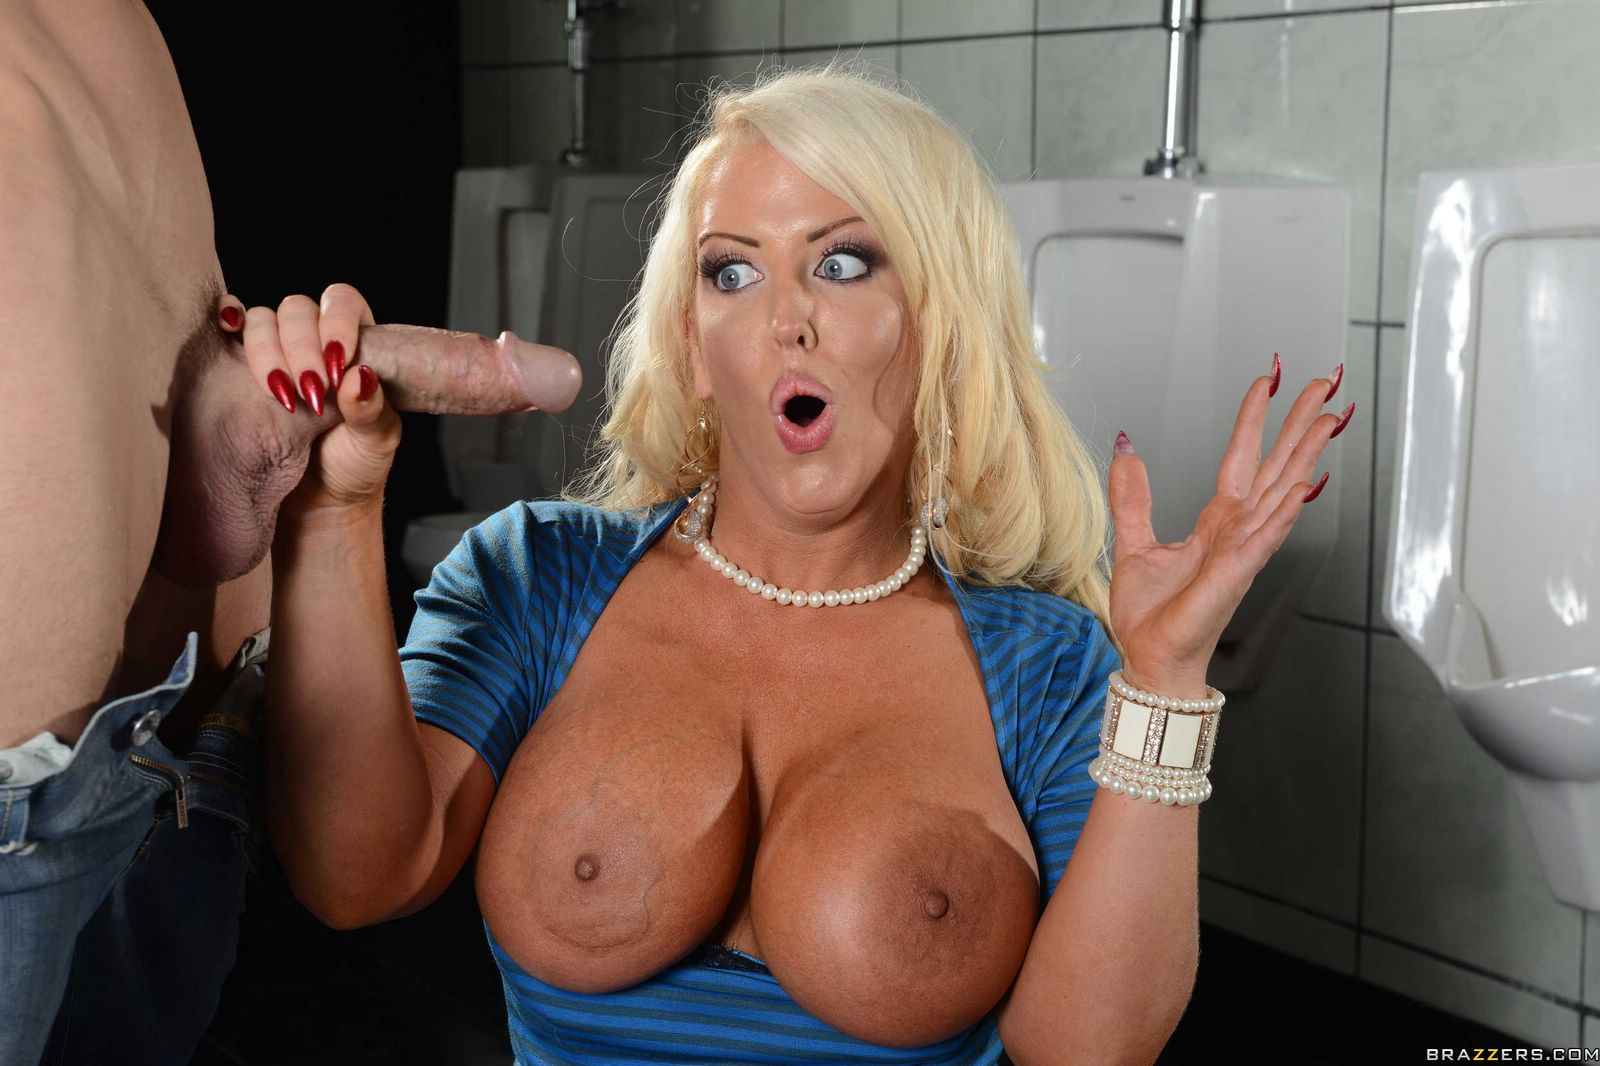 image Milf threesome revenge sex mallory sierra amp lady fyre